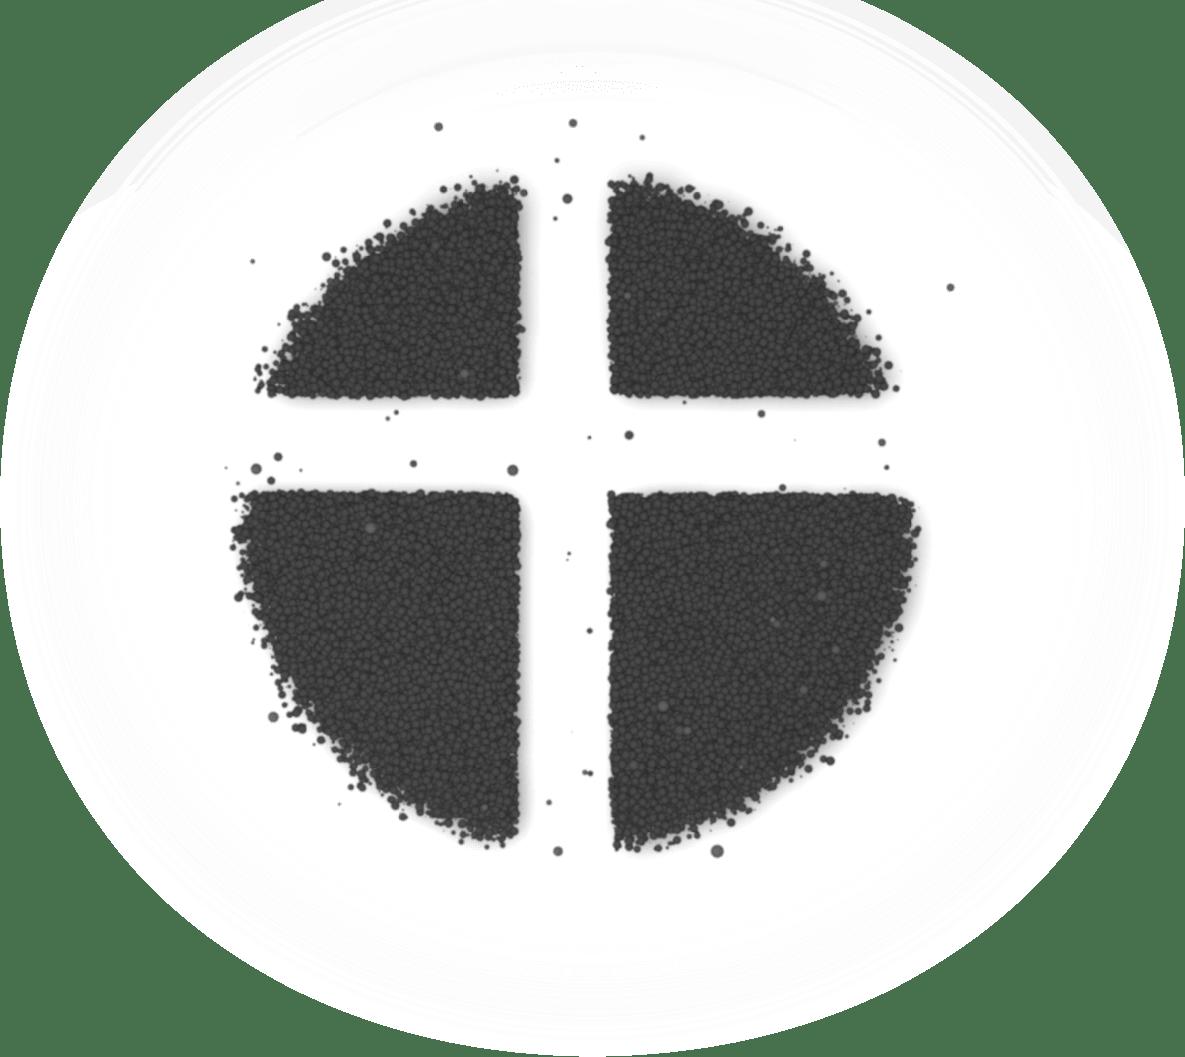 Lenten Clipart, Lenten Graphics, Lenten Images.